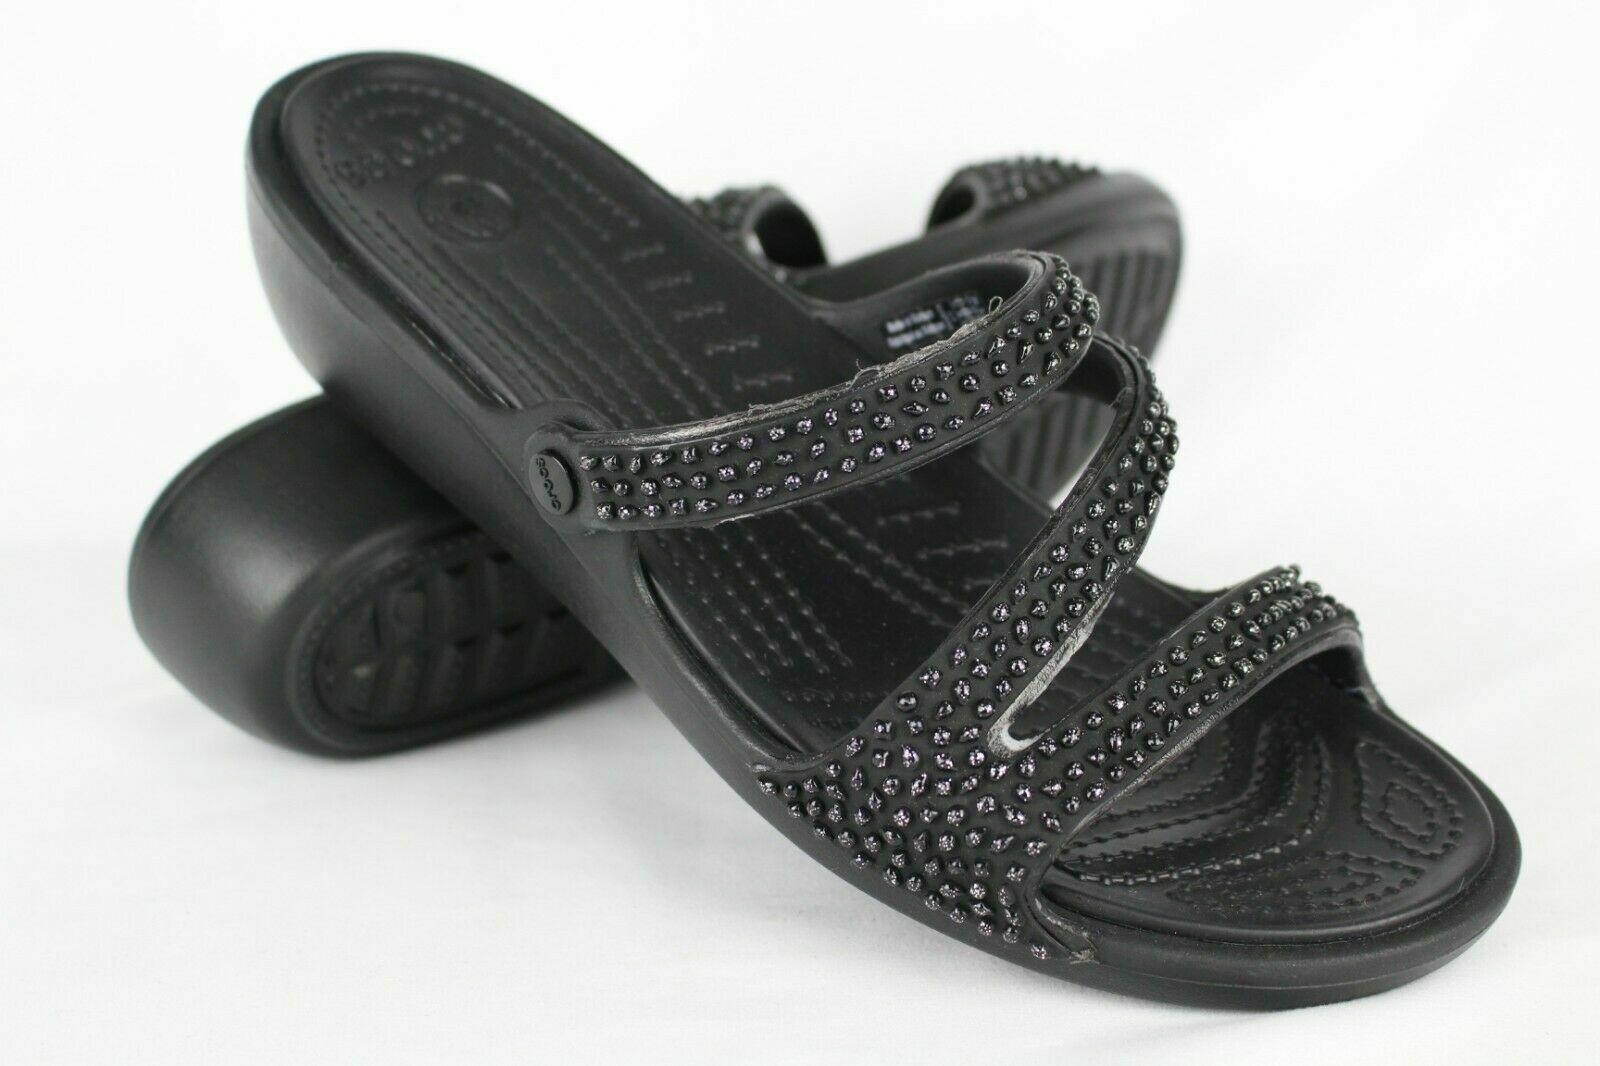 New Crocs Women's Patricia Diamante Wedge Slide Sandals 9 10